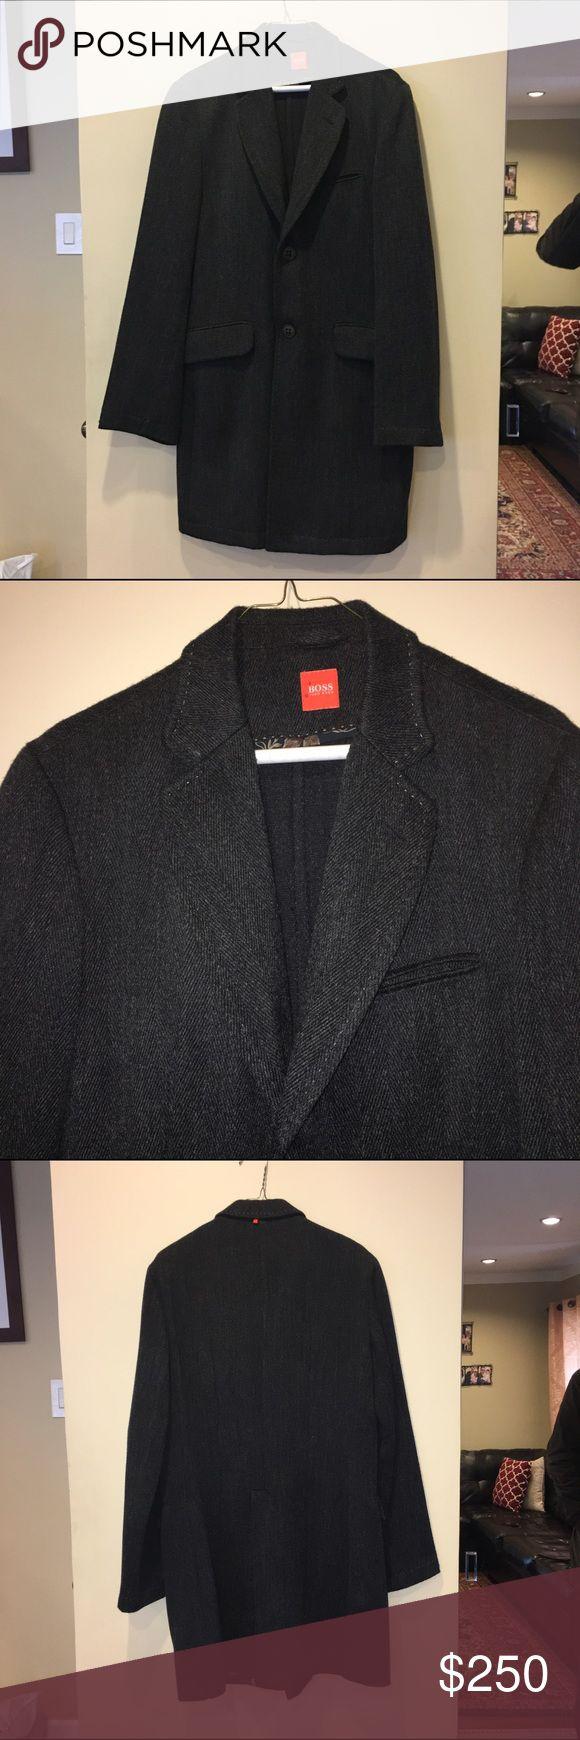 Hugo boss orange label coat Hugo boss orange label coat. Wool blend. Great condition. Size 38R mens Hugo Boss Jackets & Coats